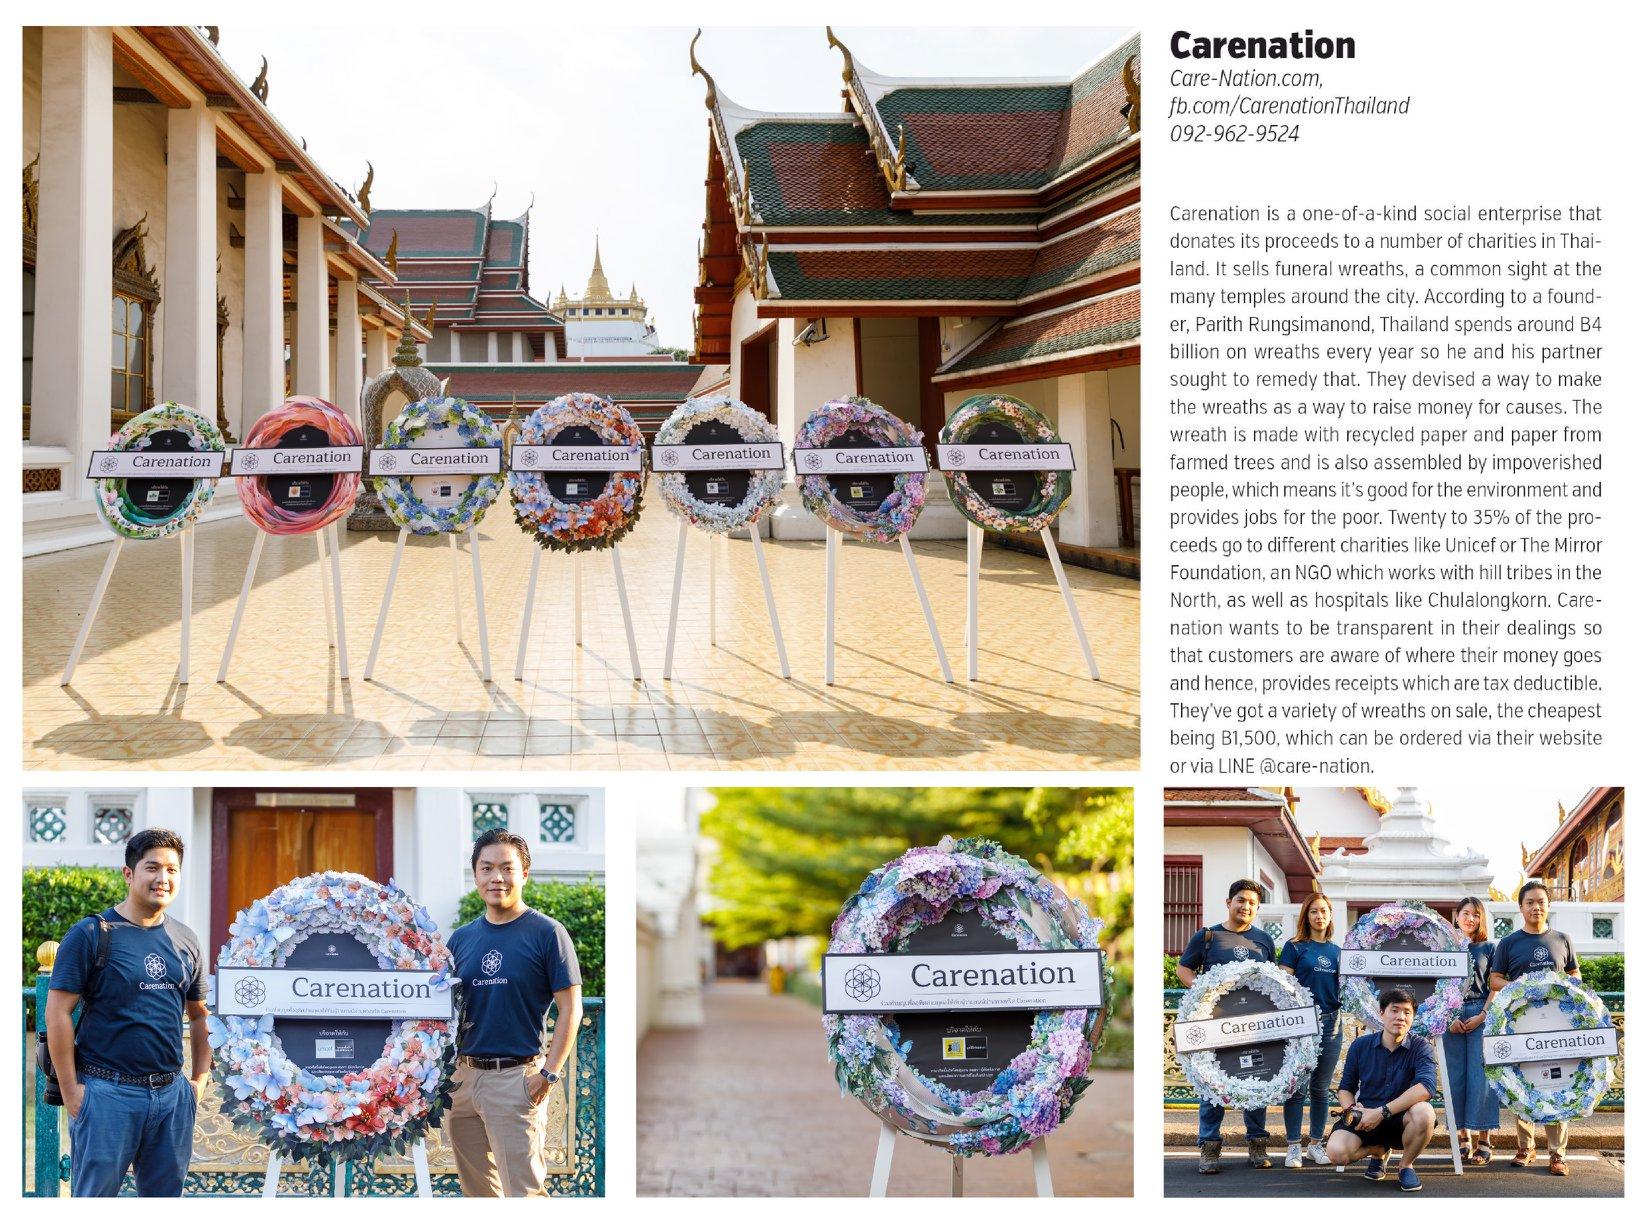 Carenation ลง Bangkok Post นิตยสาร Guru